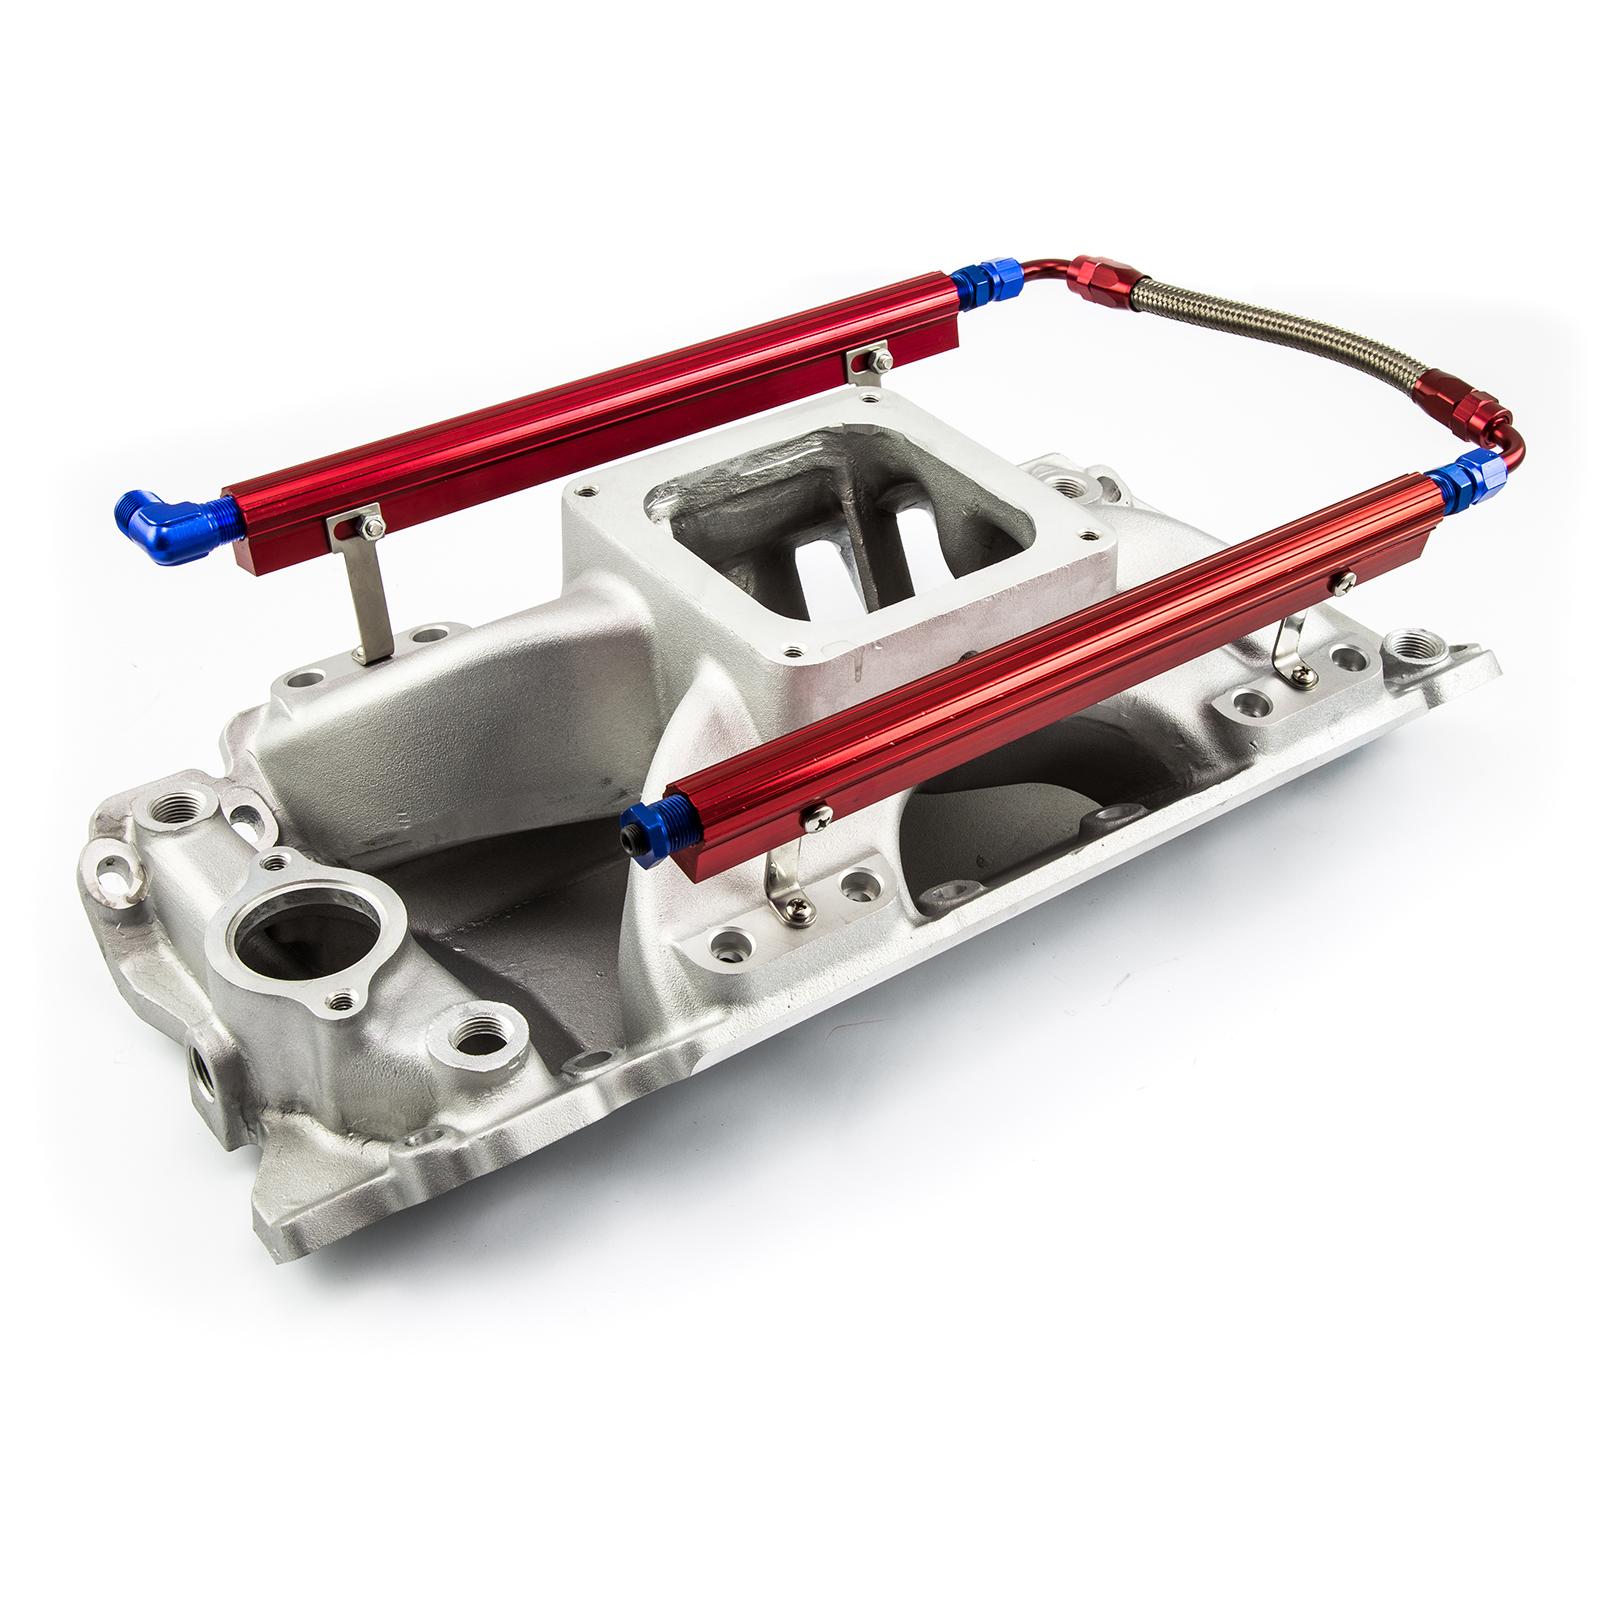 PCE® PCE148.1065 Chevy BBC 454 Rect Port Dominator w/Fuel Rails High Rise Intake Manifold Satin